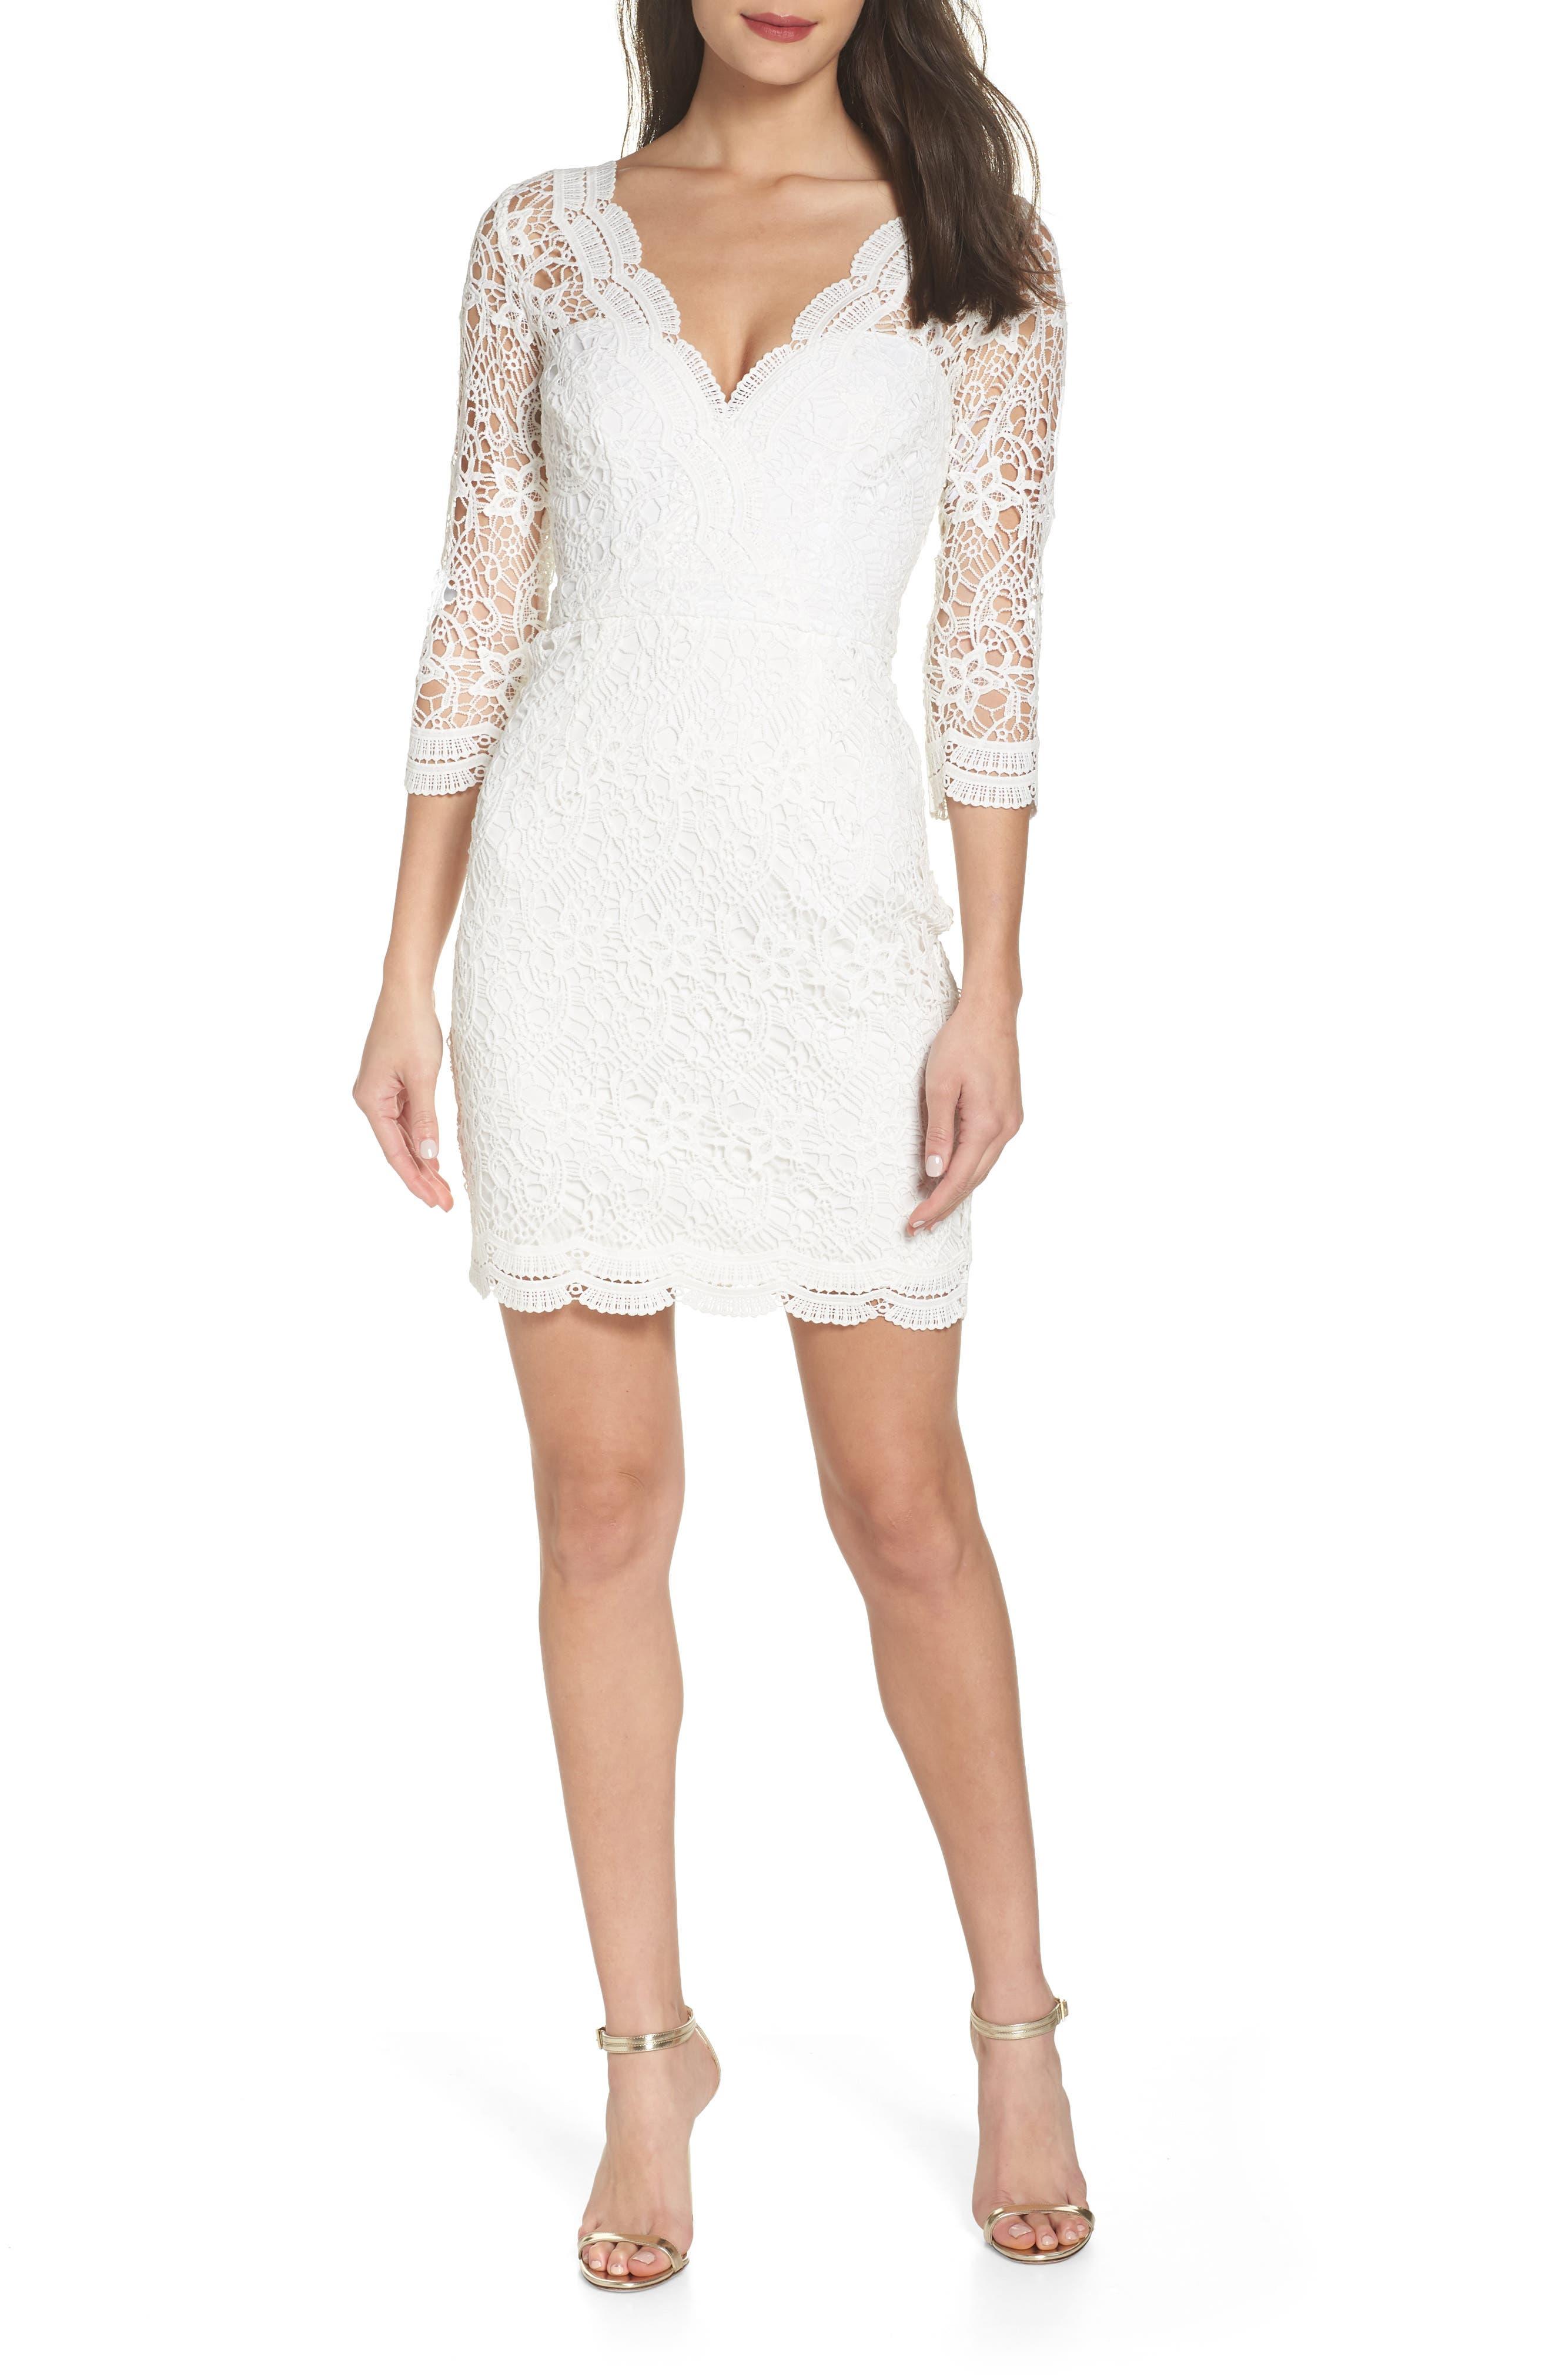 Lulus Lace Cocktail Dress, White